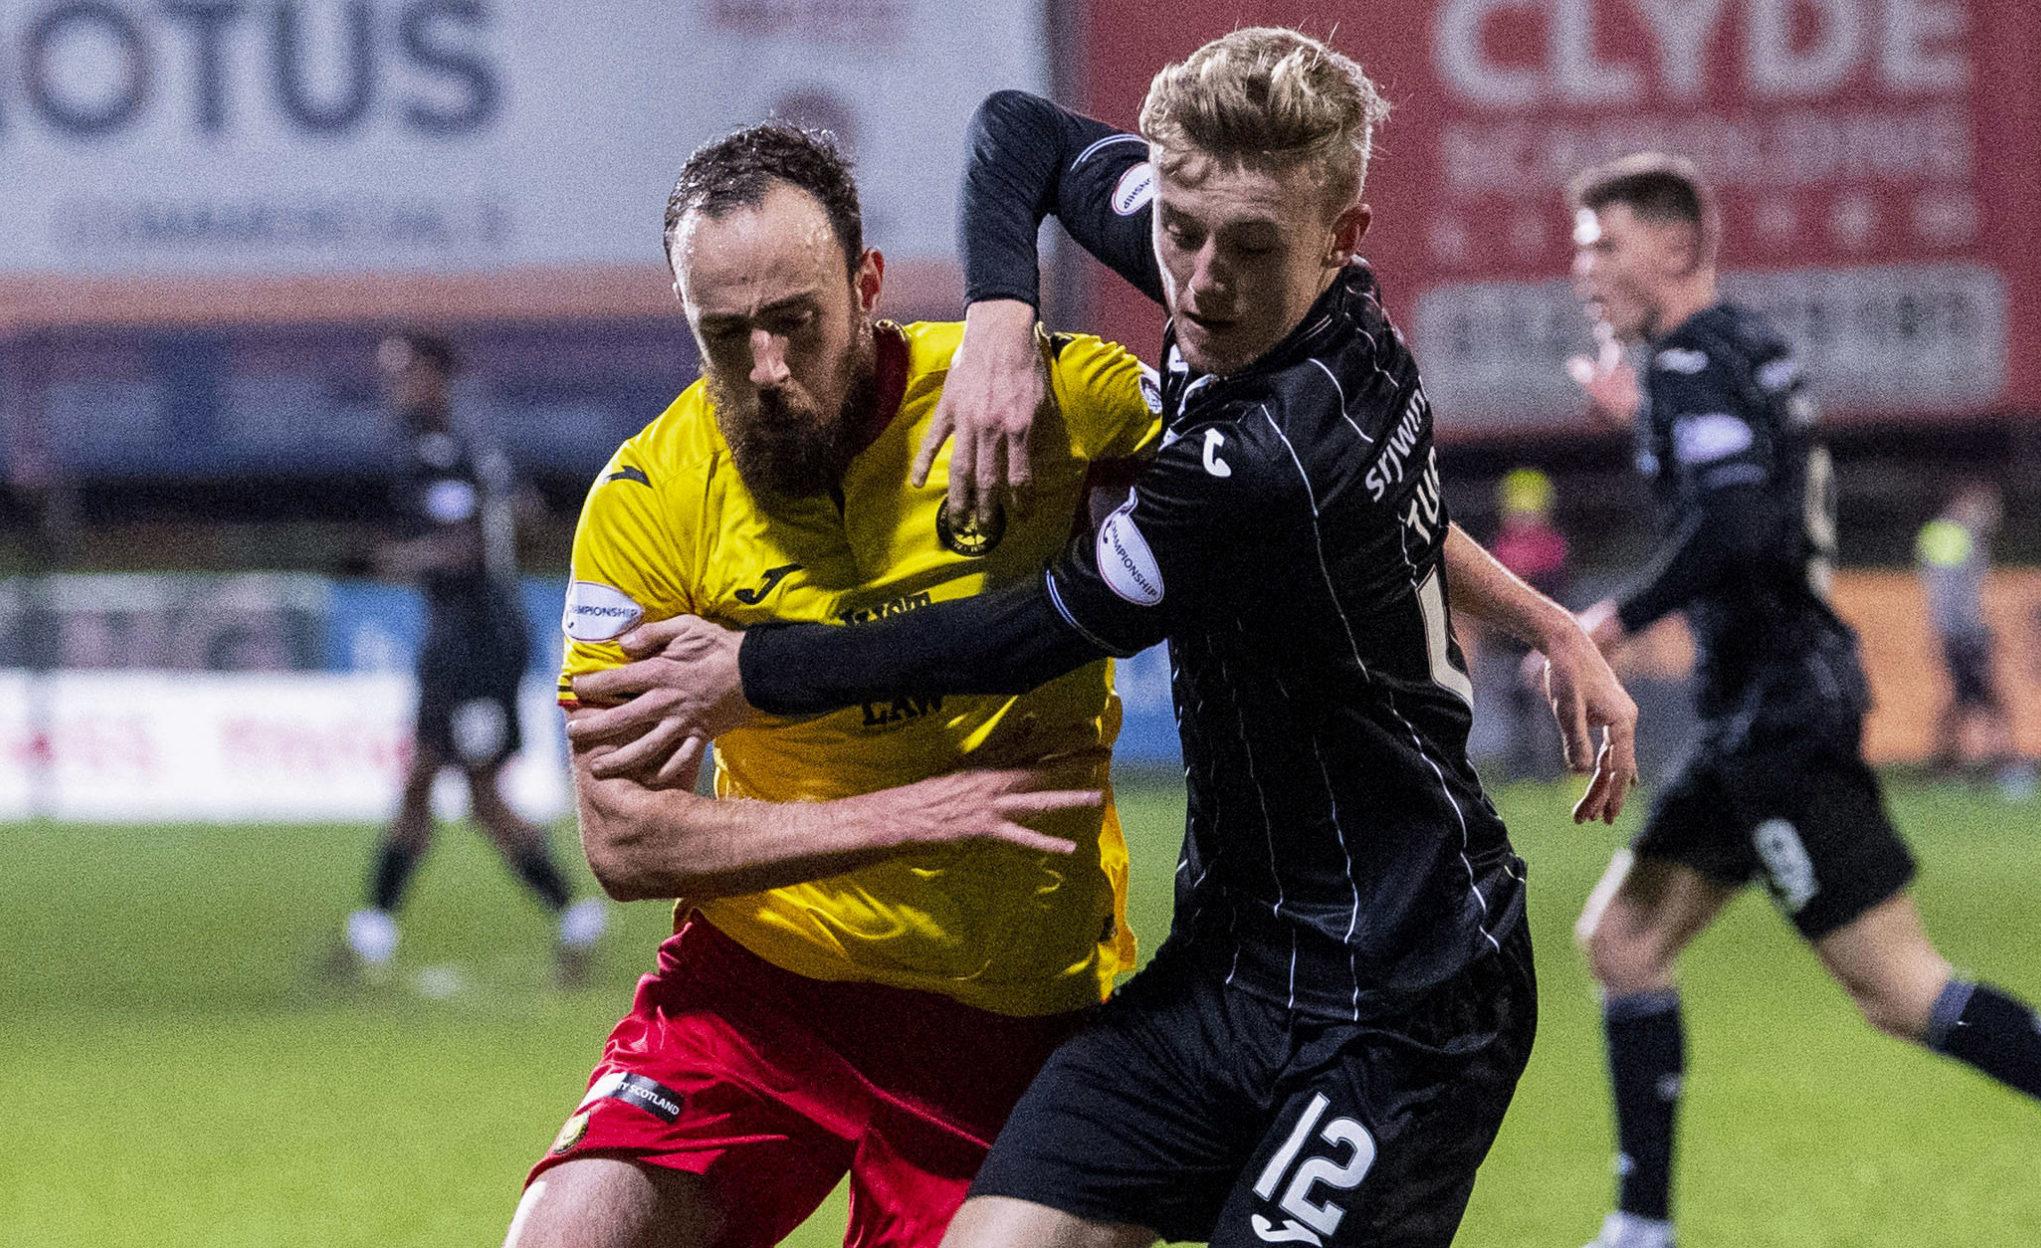 Partick's Stuart Bannigan (left) challenges Dunfermline's Kyle Turner in the last game at Firhill before the coronavirus shutdown